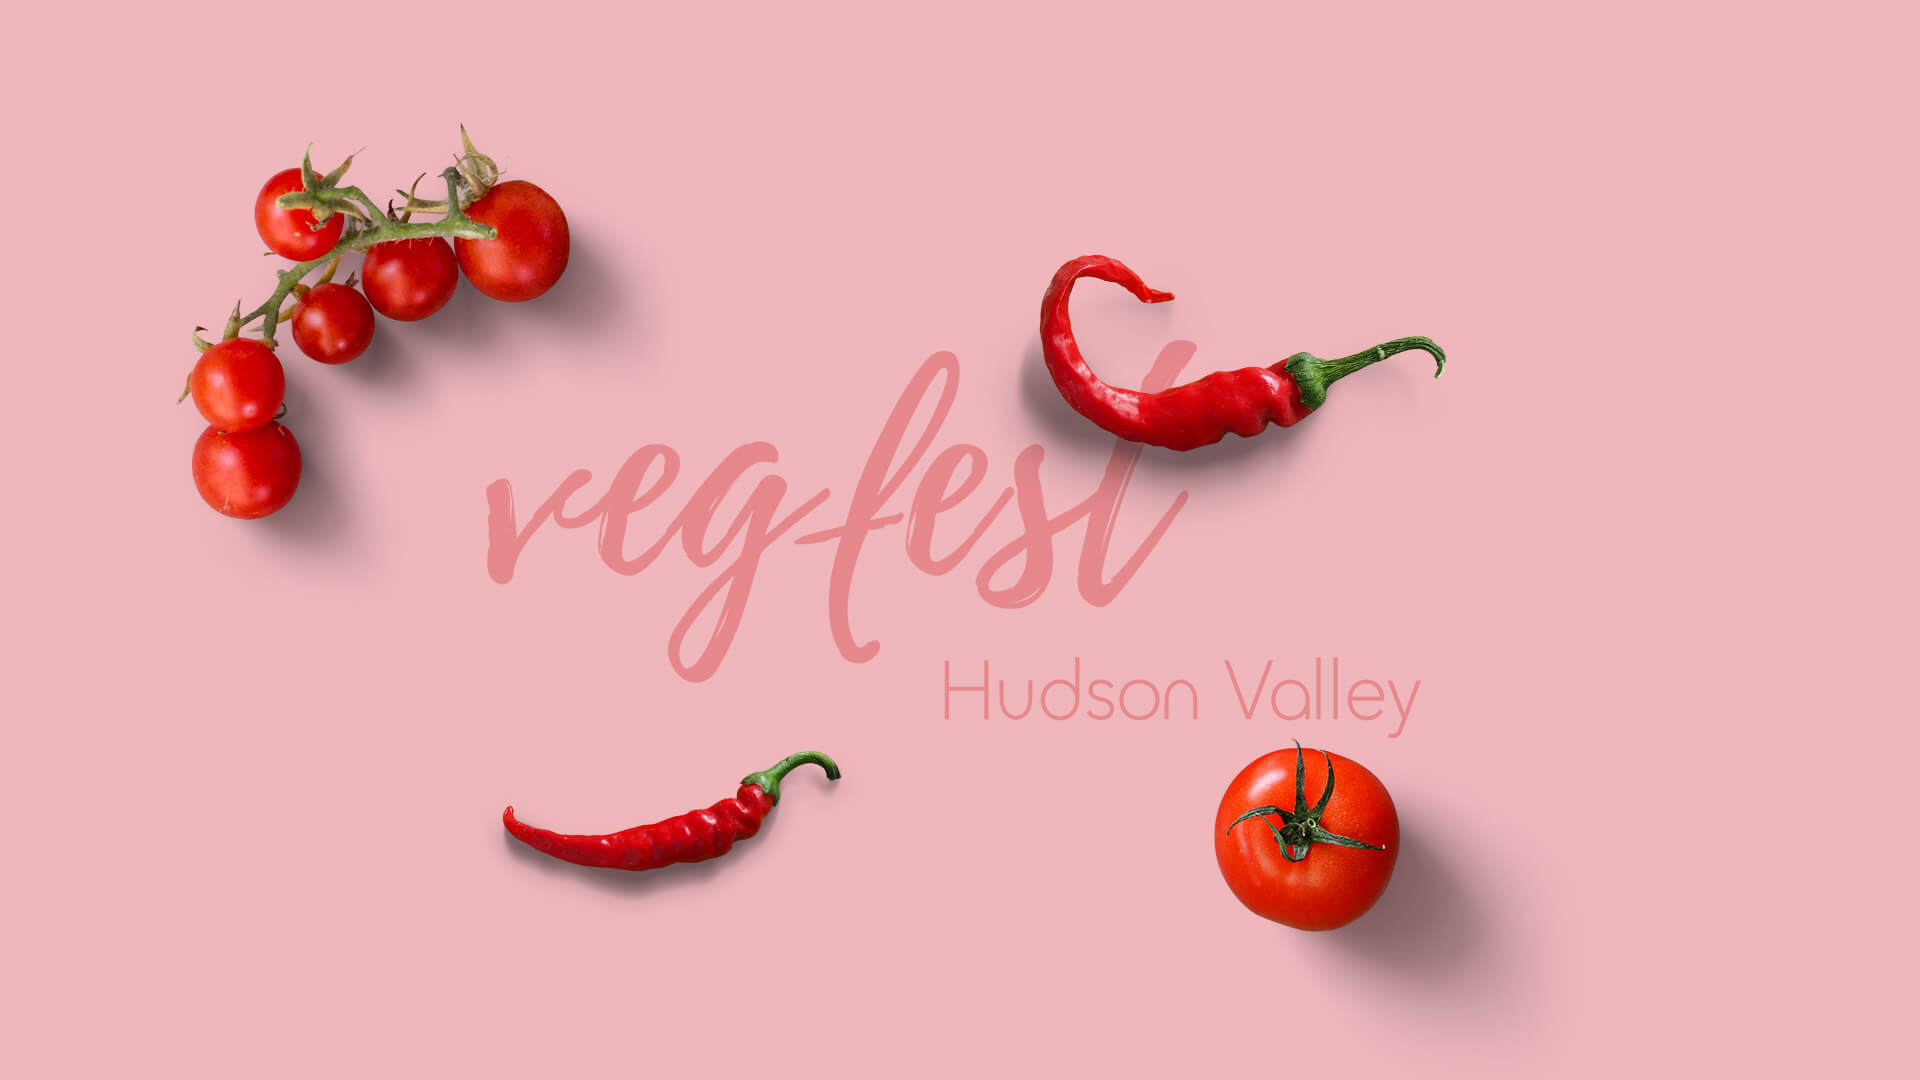 vegfest_4